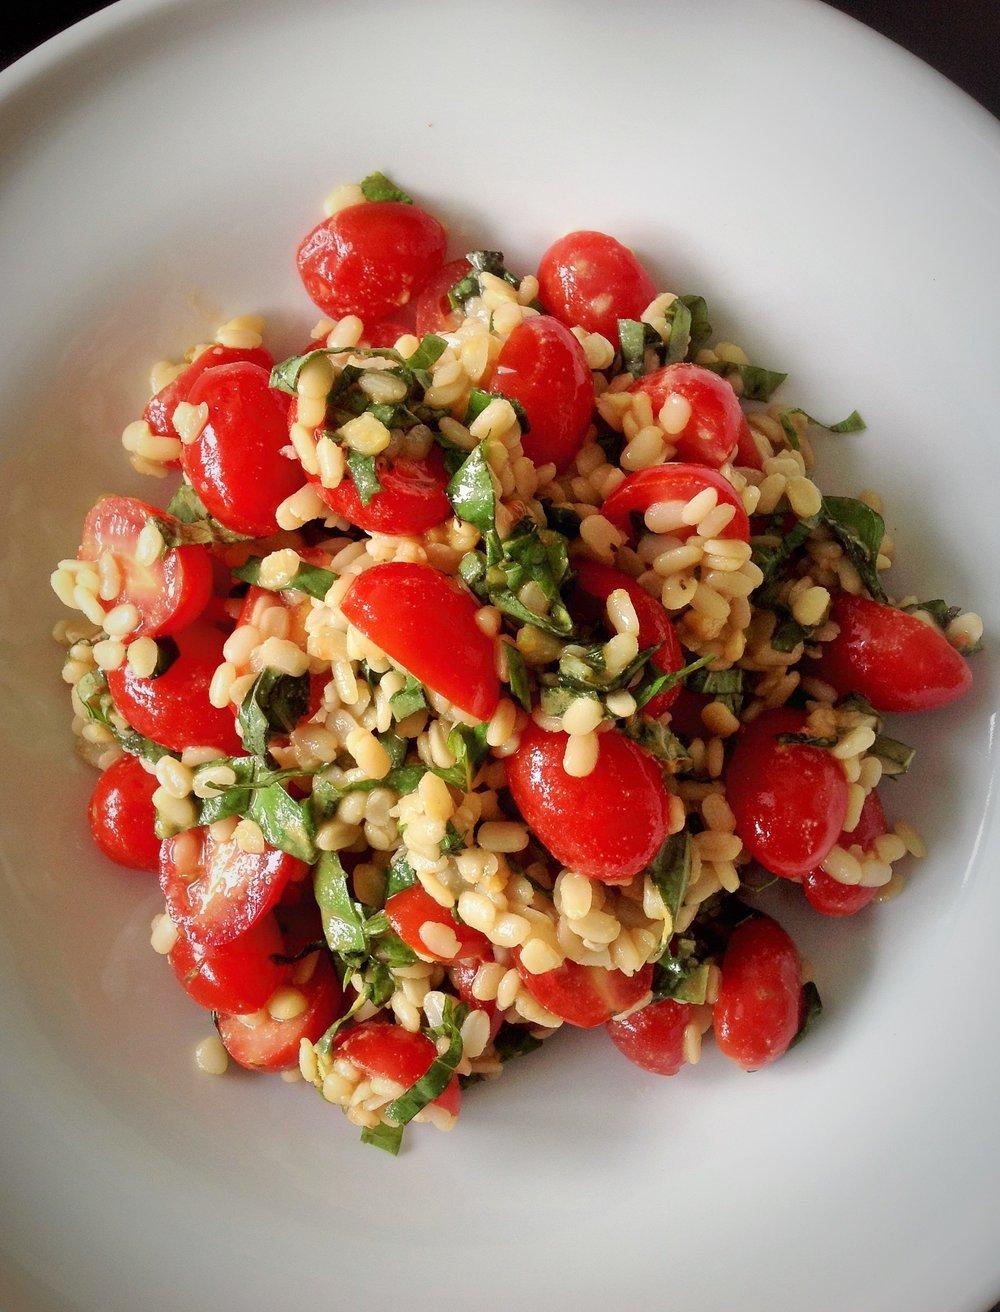 White Ivory Lentil Tomato Basil Salad - Healthy, Gluten-Free, Oil-Free, Plant-Based Vegan